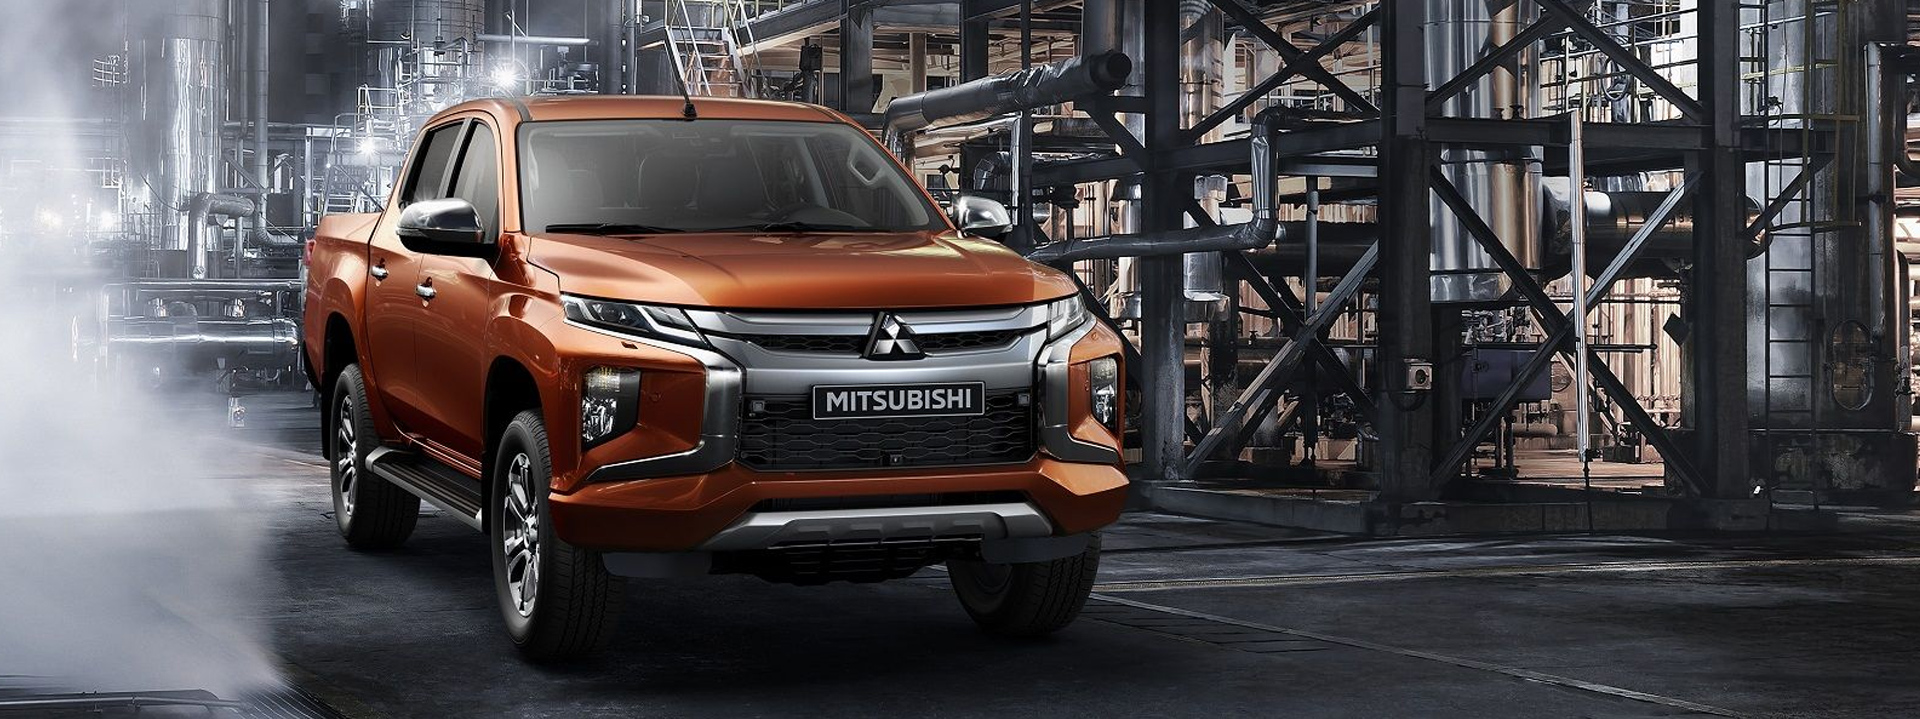 2019 Mitsubishi L200 Programmable